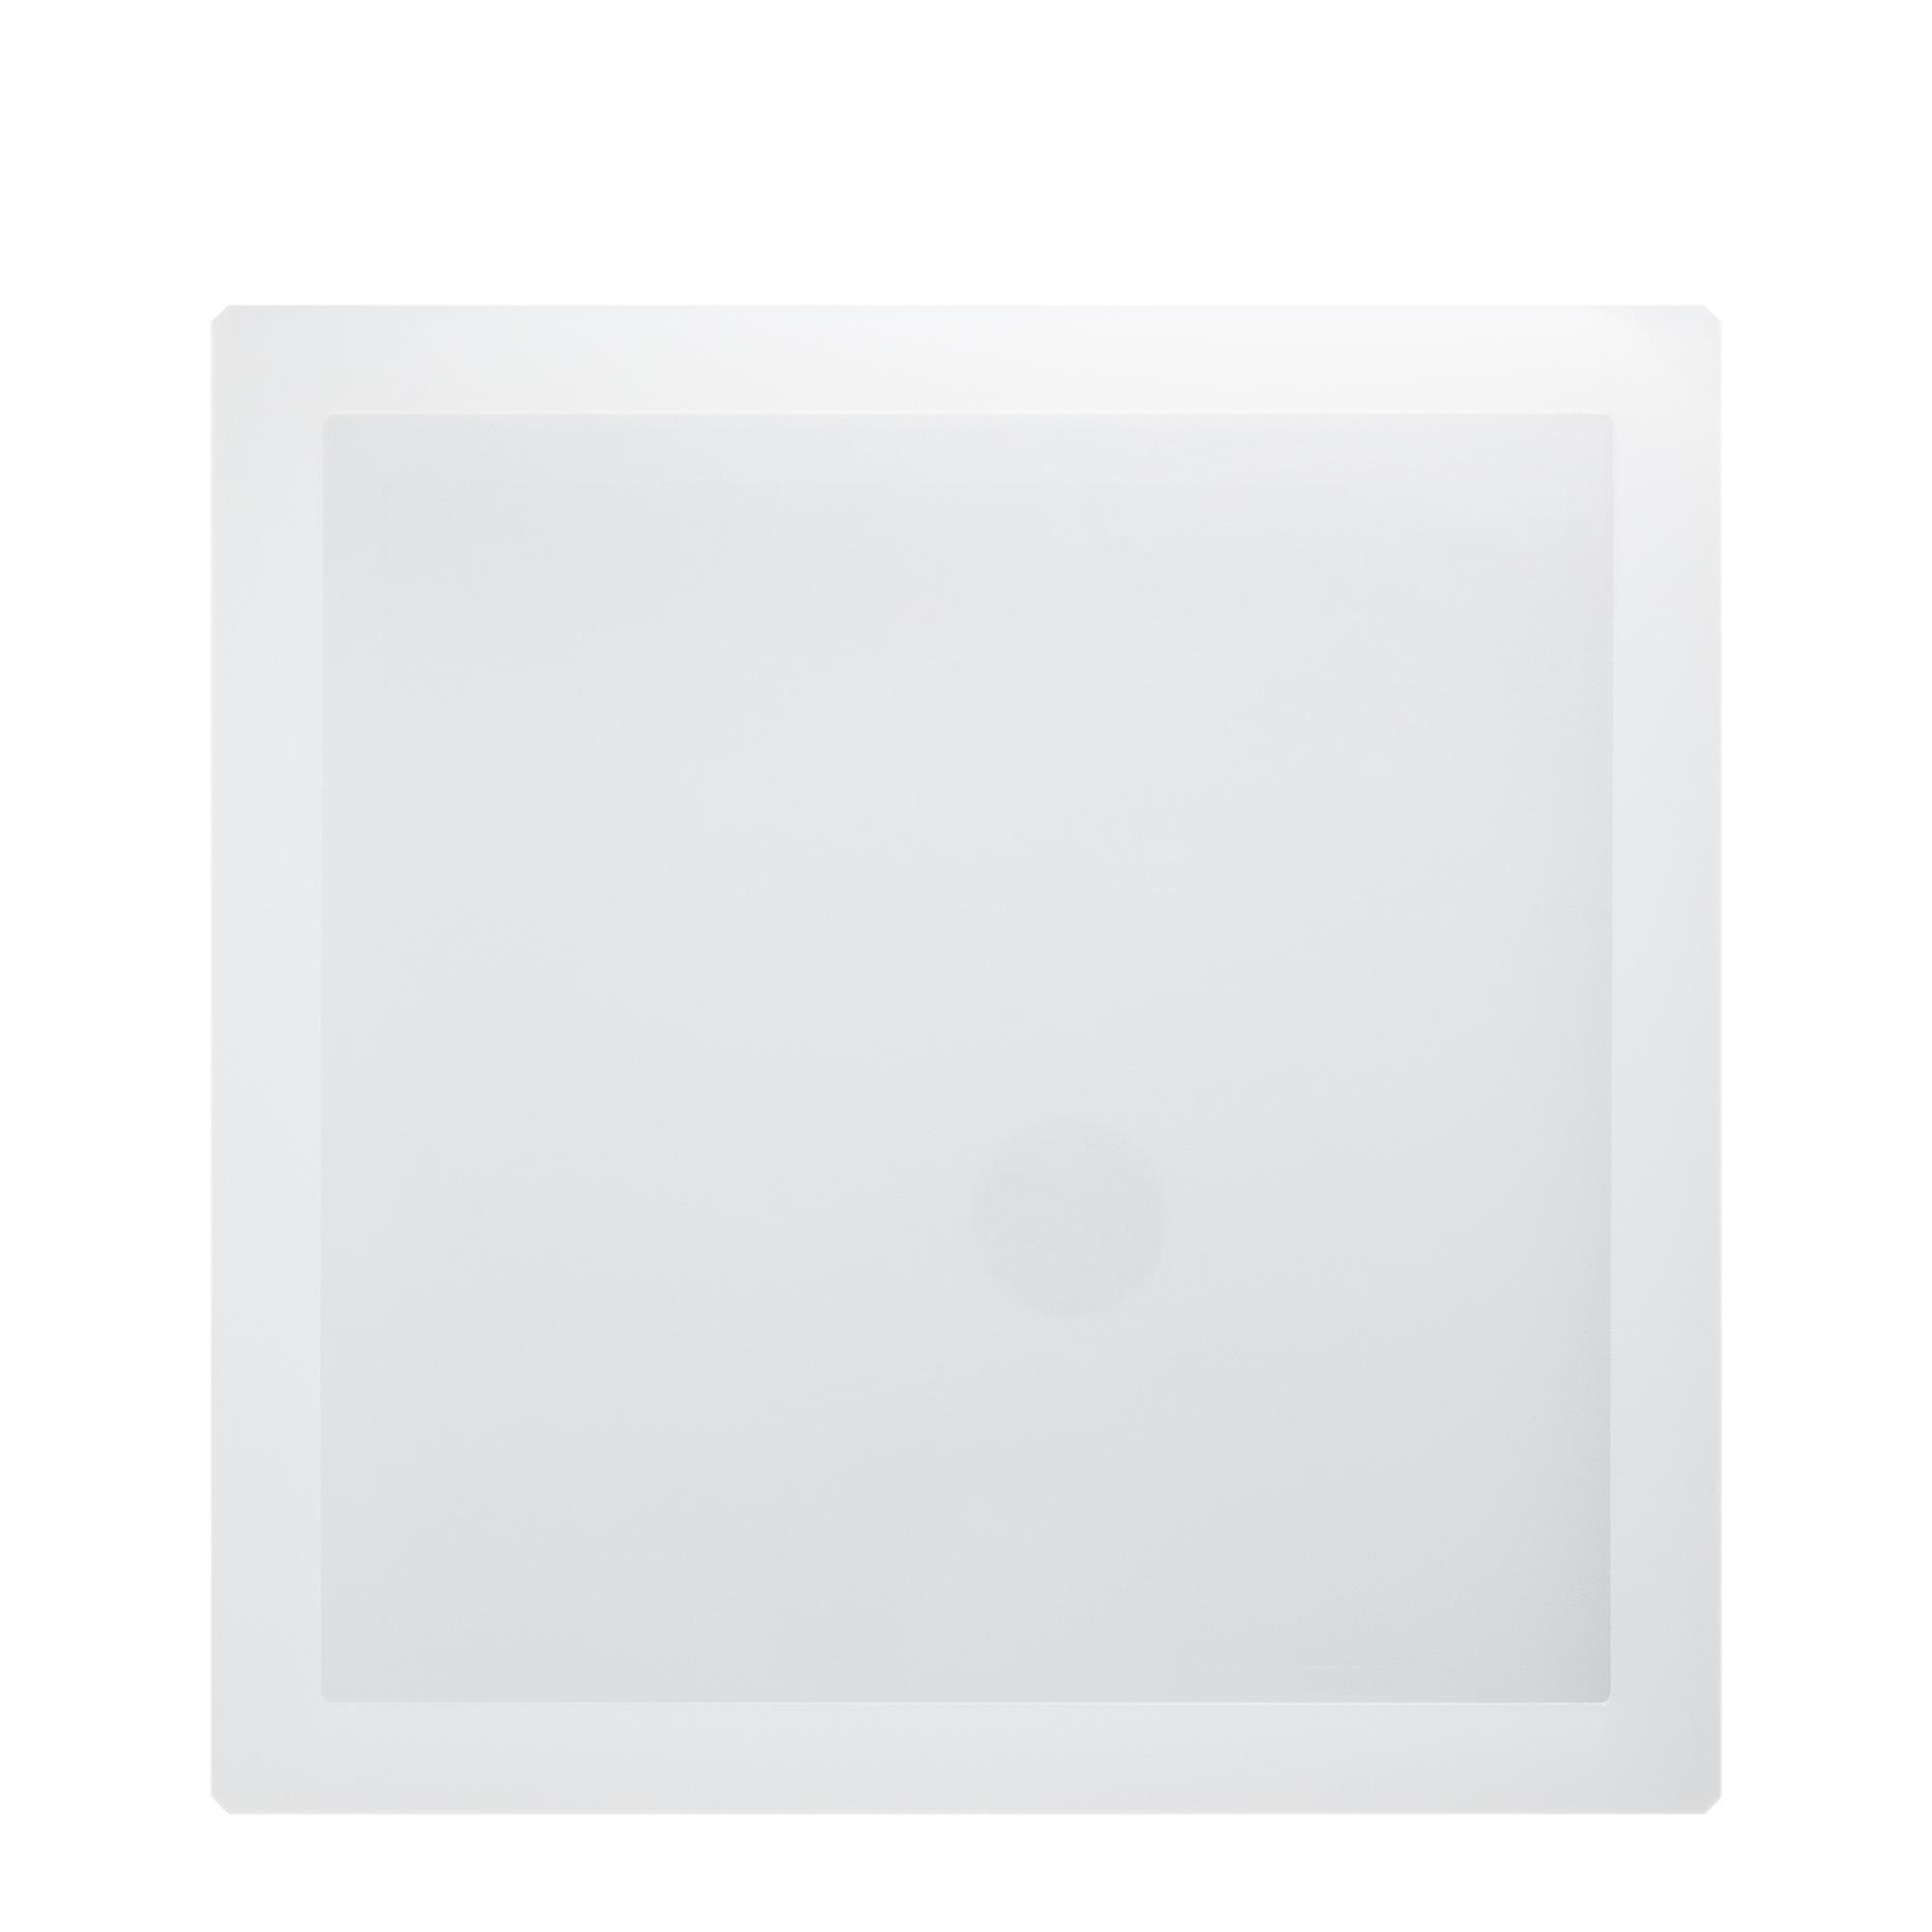 Casting Frame Mold 0,2